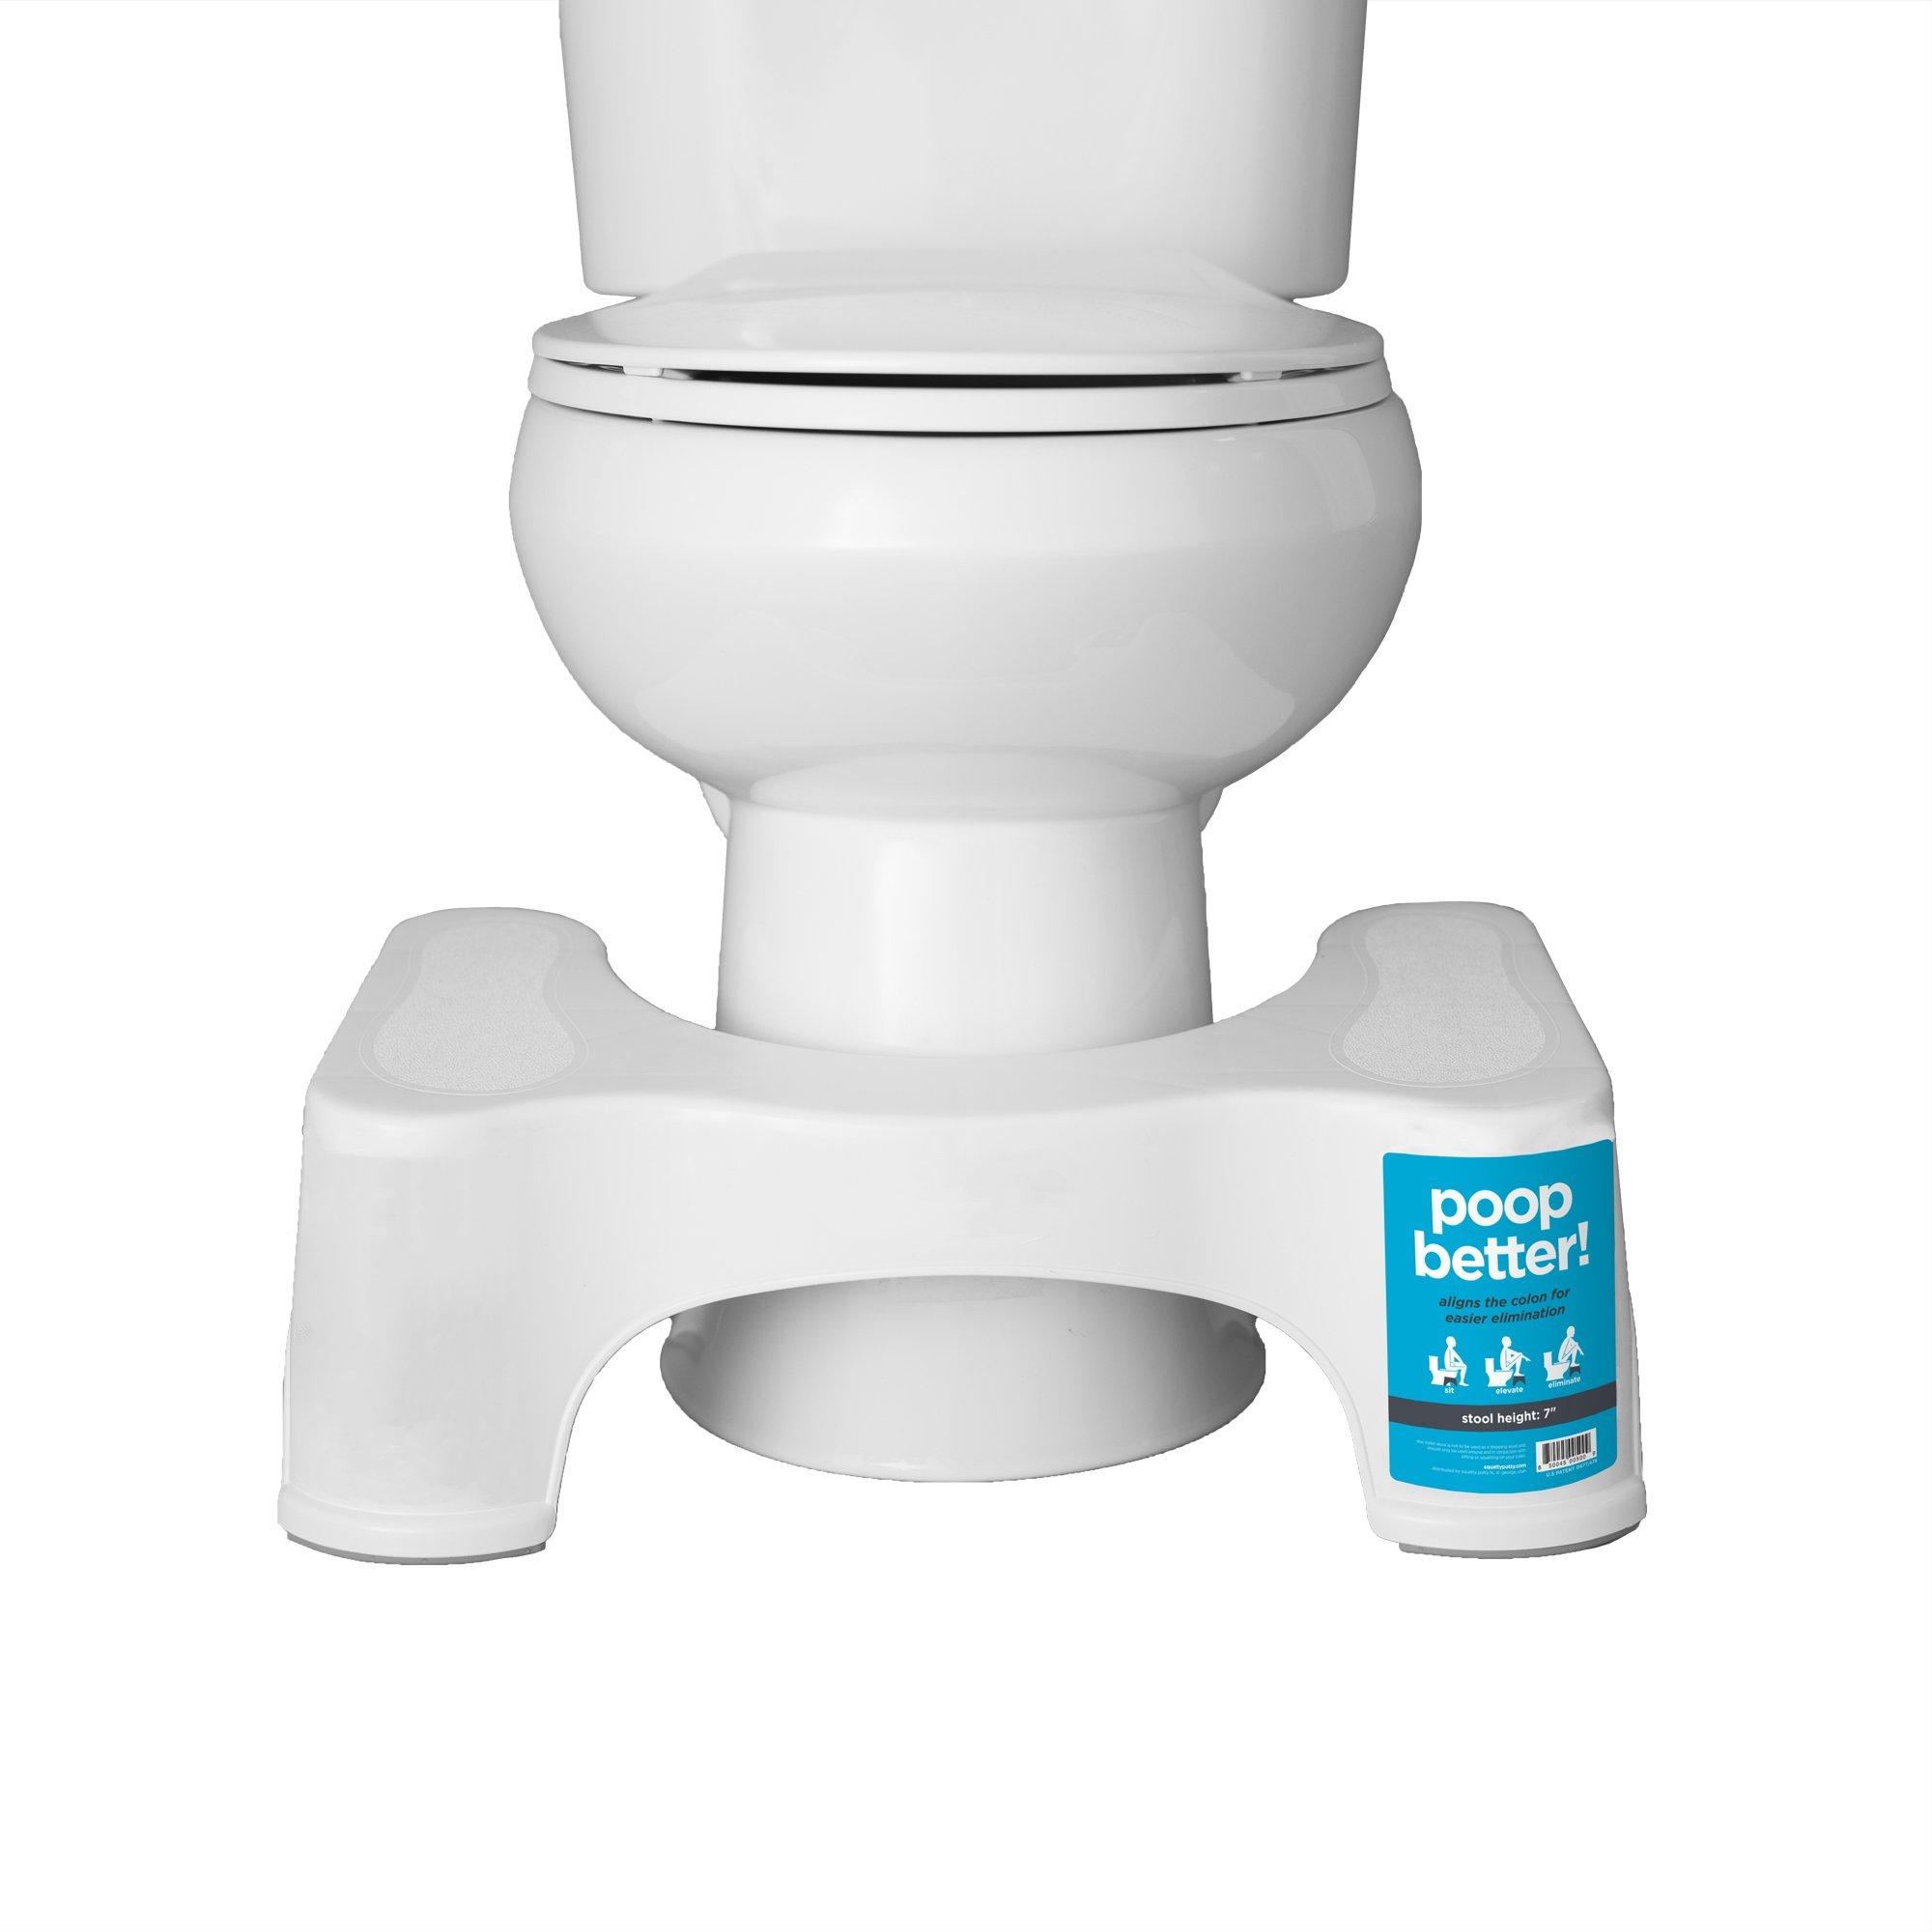 Galleon Squatty Potty The Original Bathroom Toilet Stool